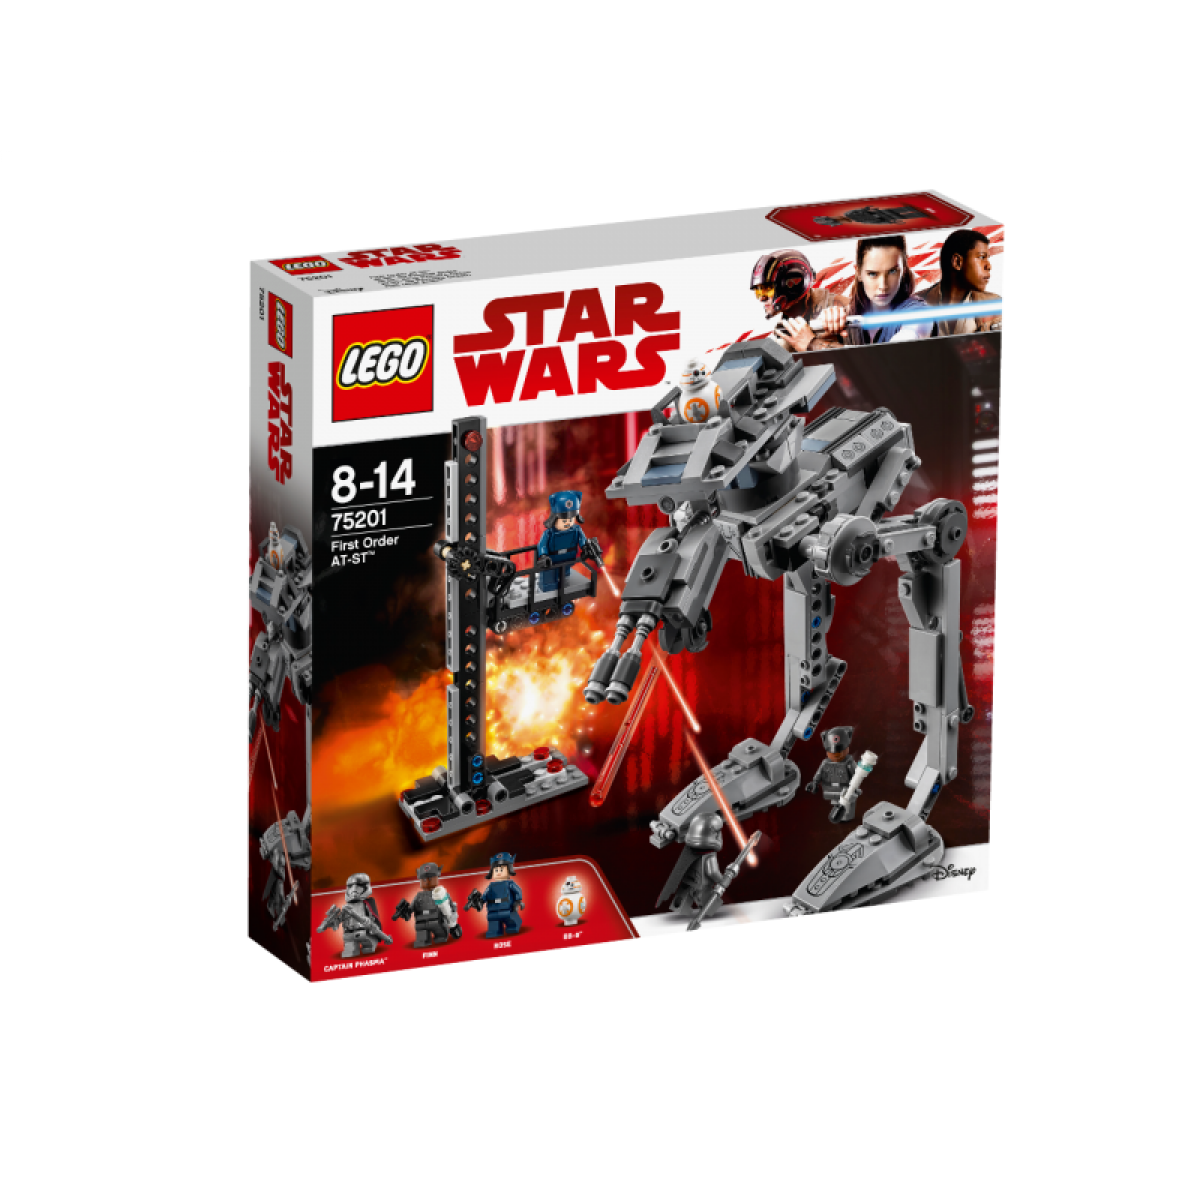 LEGO Star Wars 75201 AT-ST™ Prvého rádu